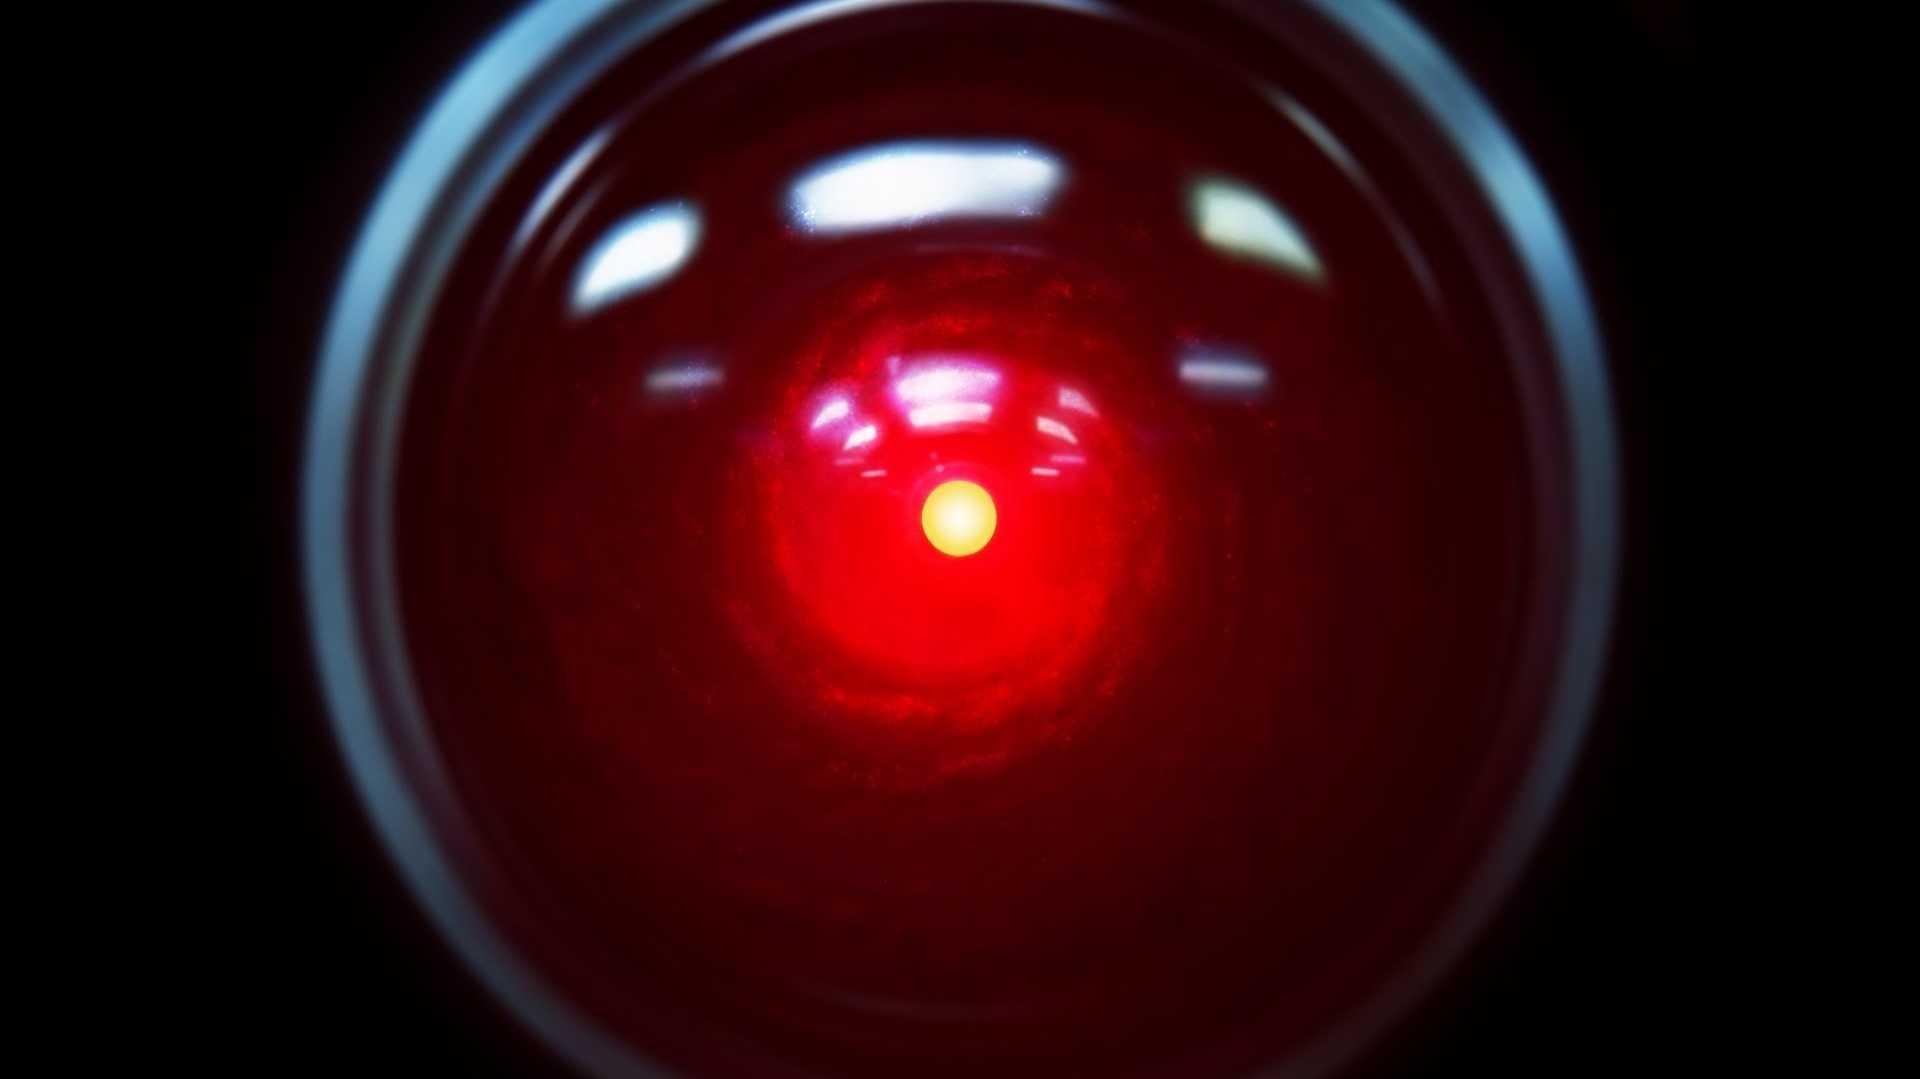 HAL 9000, Odyssee im Weltraum, 2001